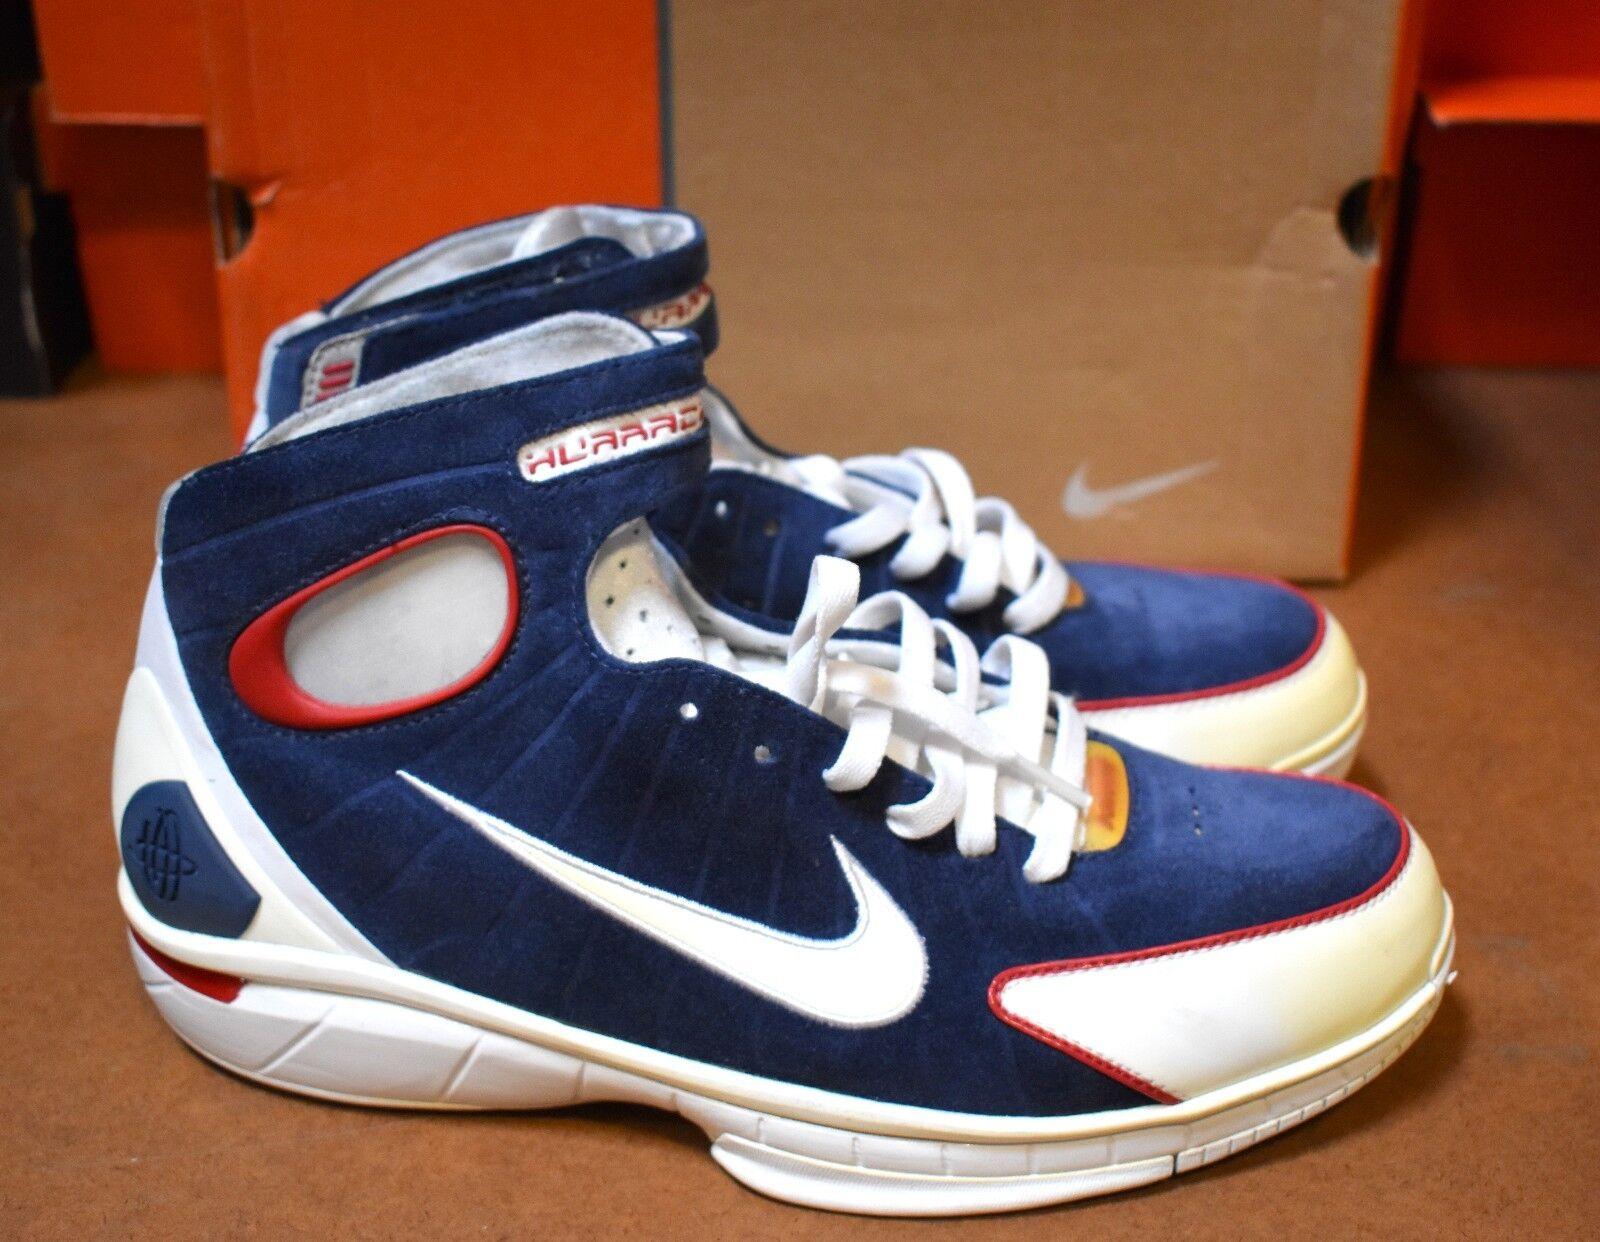 Nike OG Air Zoom Huarache Huarache Huarache Midnight Navy bianca Varsity rosso 308475 411 Dimensione 11.5 e91585